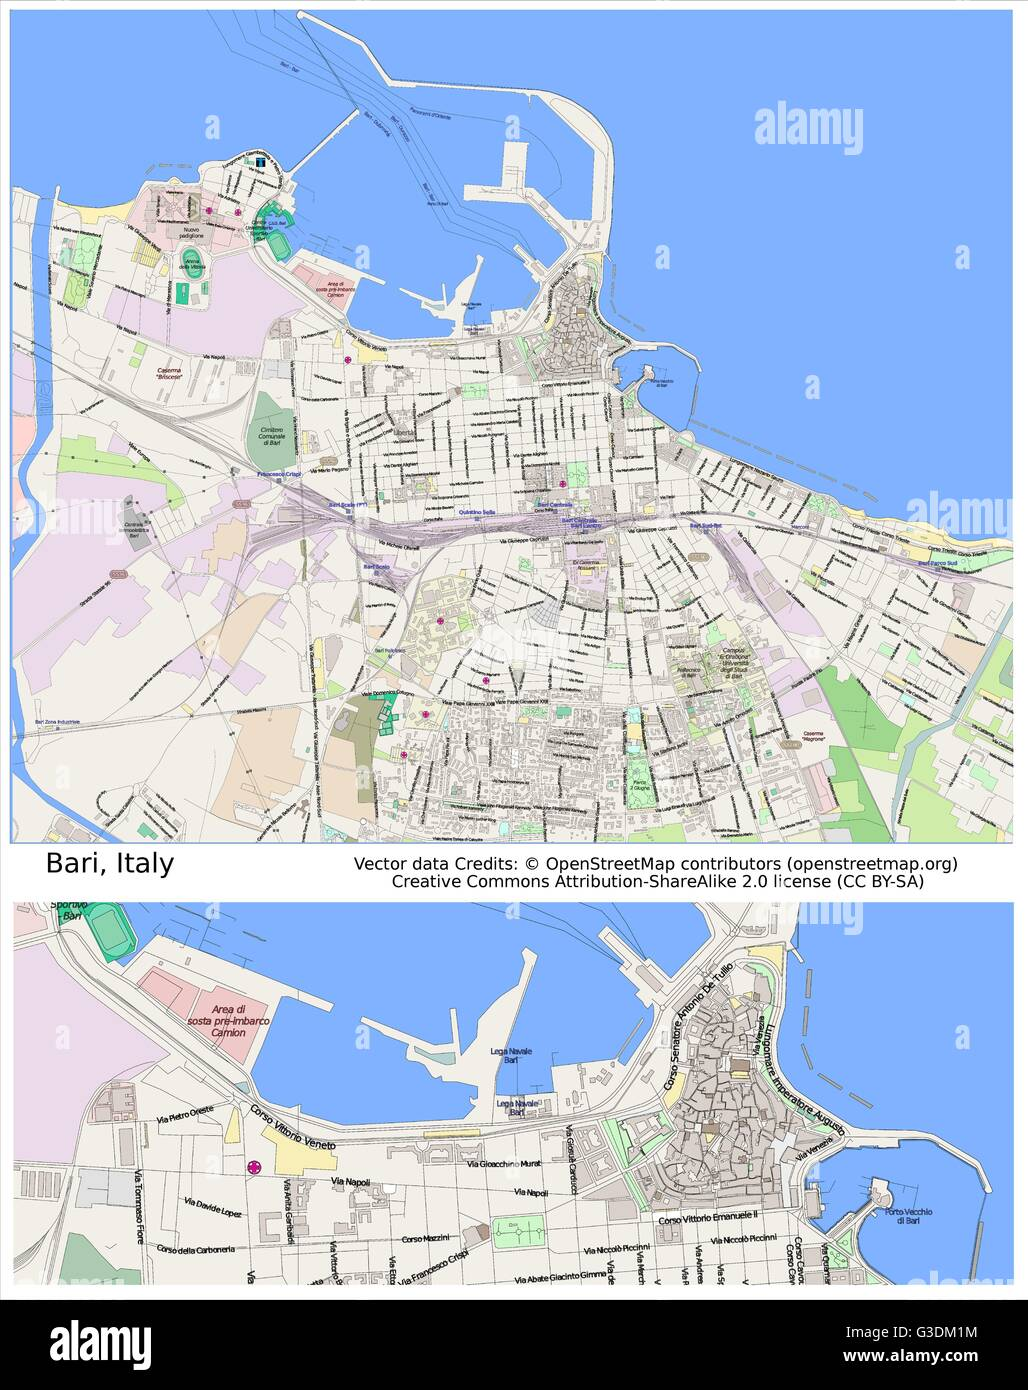 Mapa De Bari Italia.Mapa De La Ciudad De Bari En Italia Imagen Vector De Stock Alamy